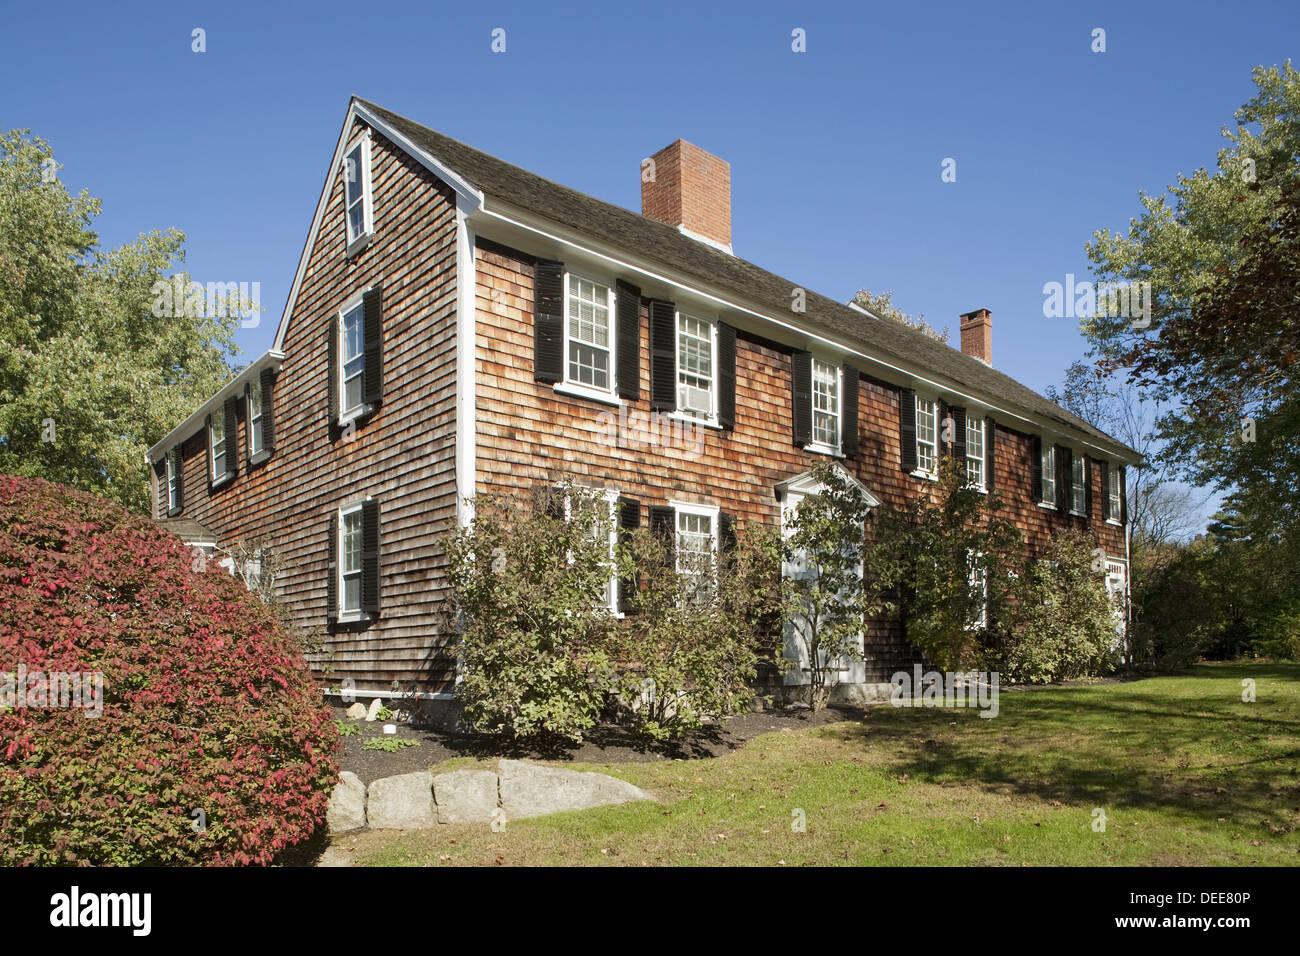 new england colonial farmhouse stock photos & new england colonial